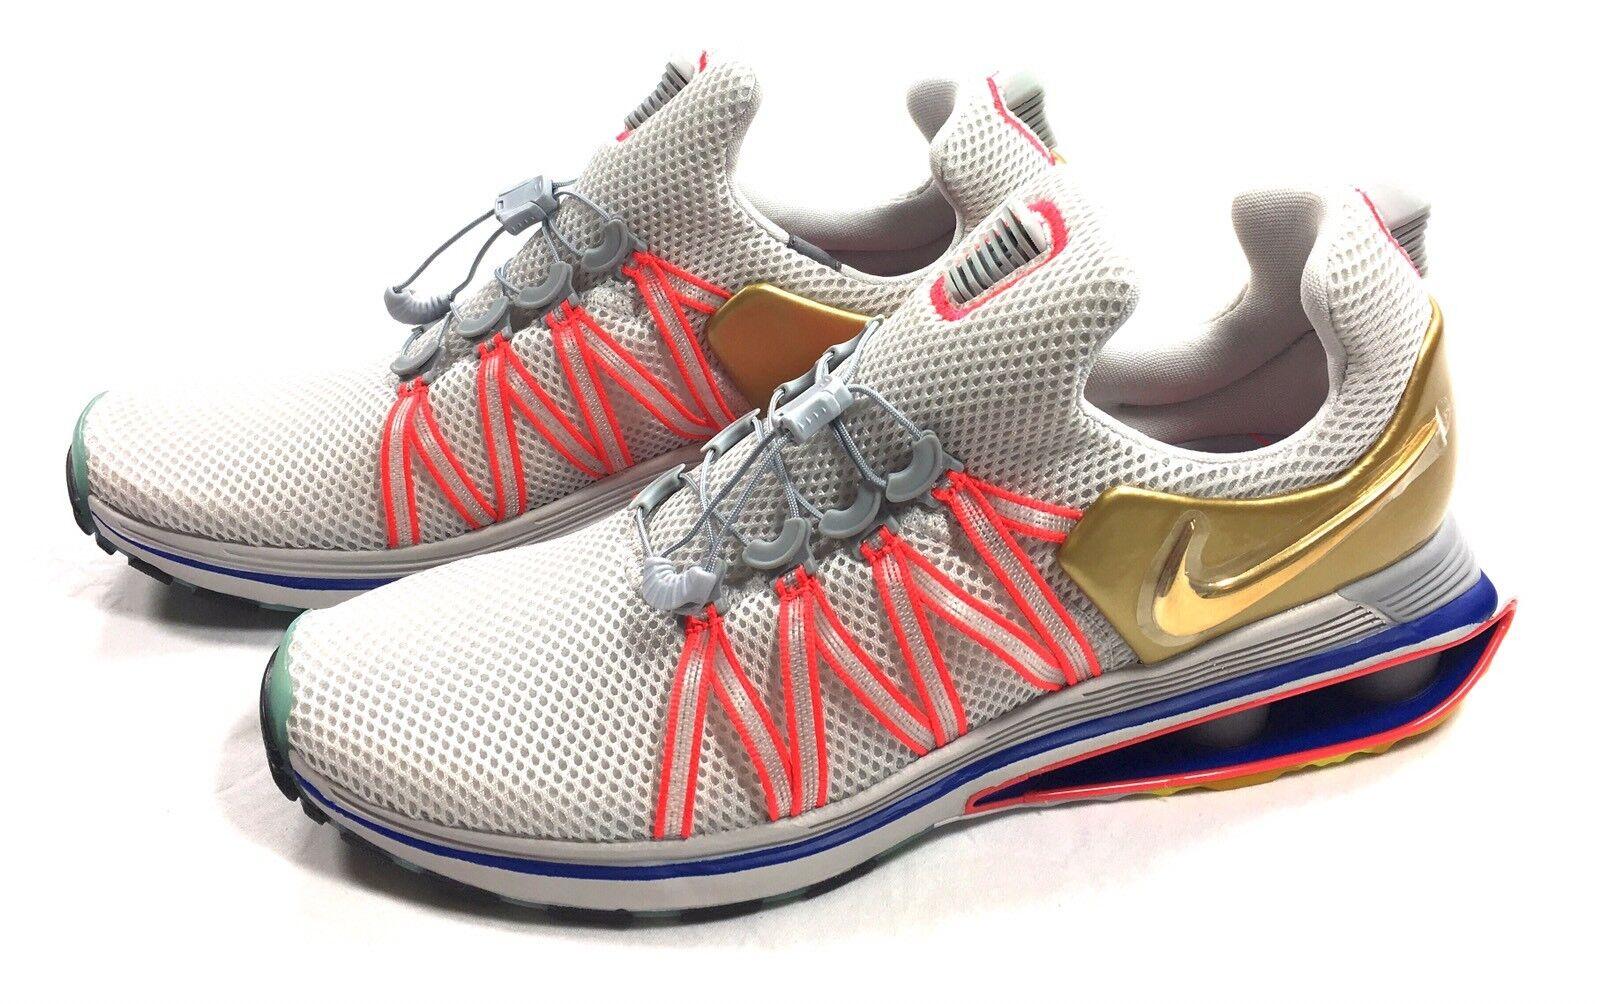 Nike Shox Gravity Men's Shoes Vast Grey Metallic Gold AQ8553-009